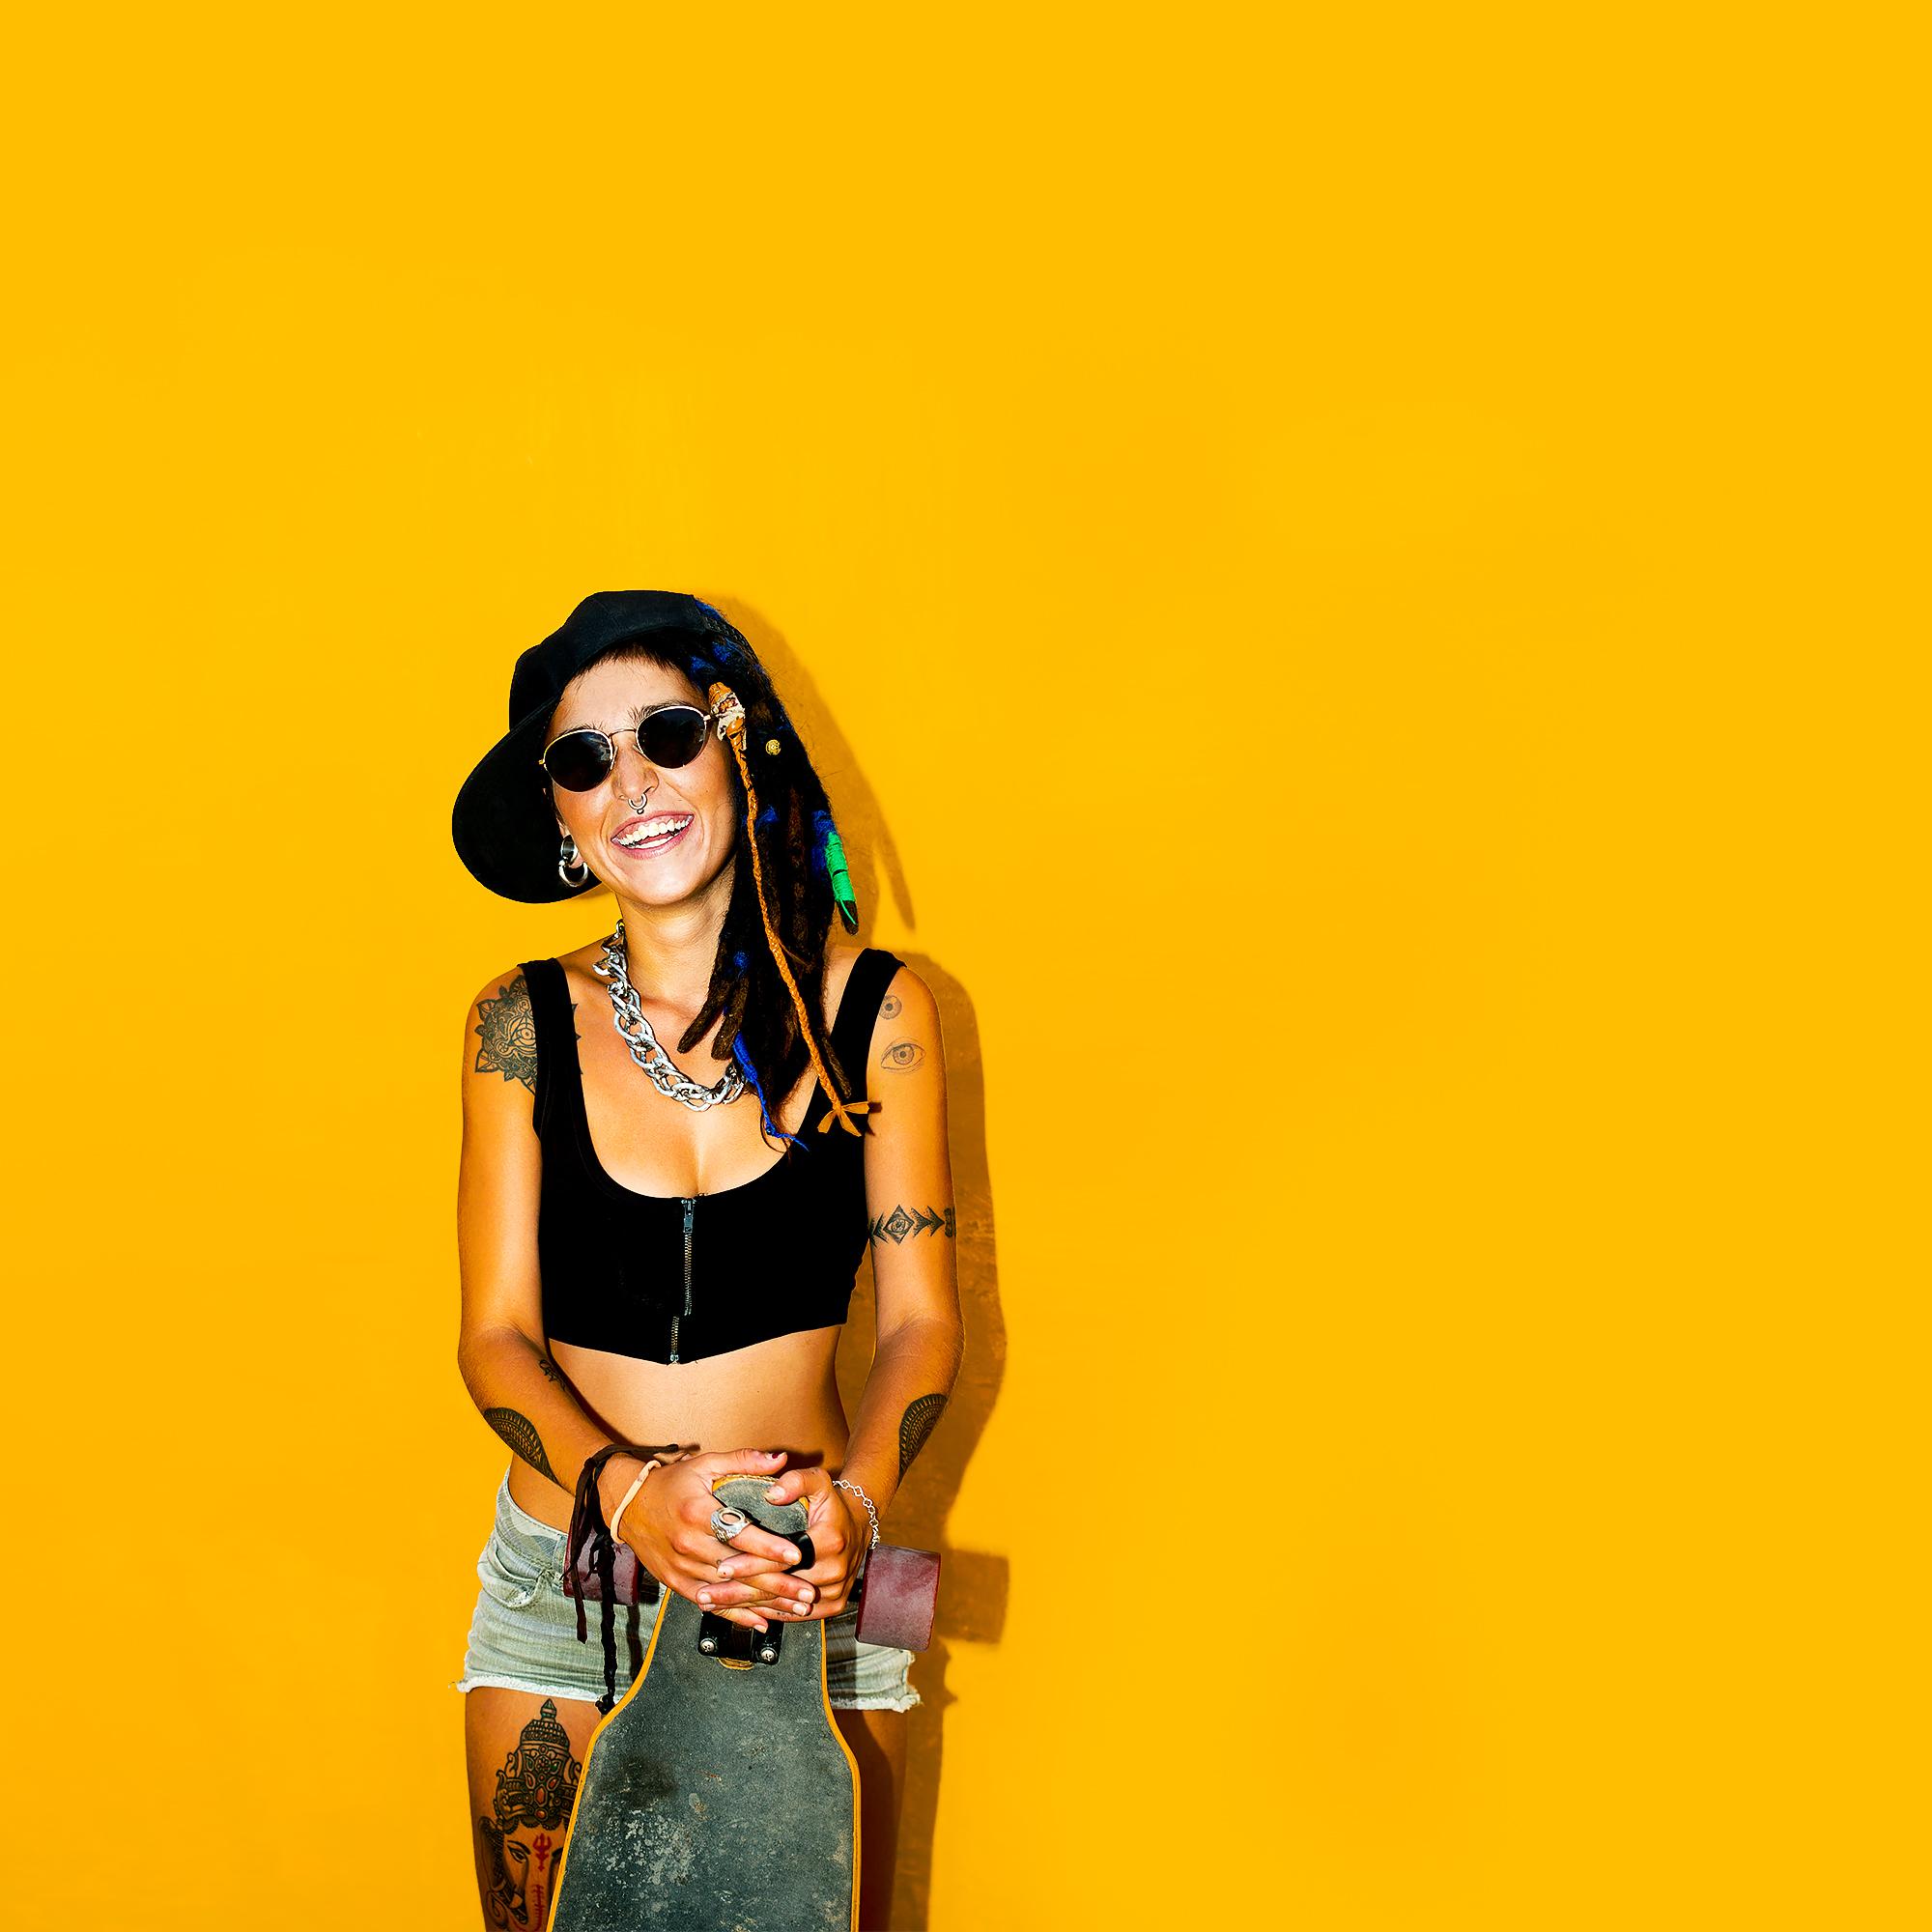 fashion-rasta-girl-with-dreadlocks-and-tattoos-PEG2DL5